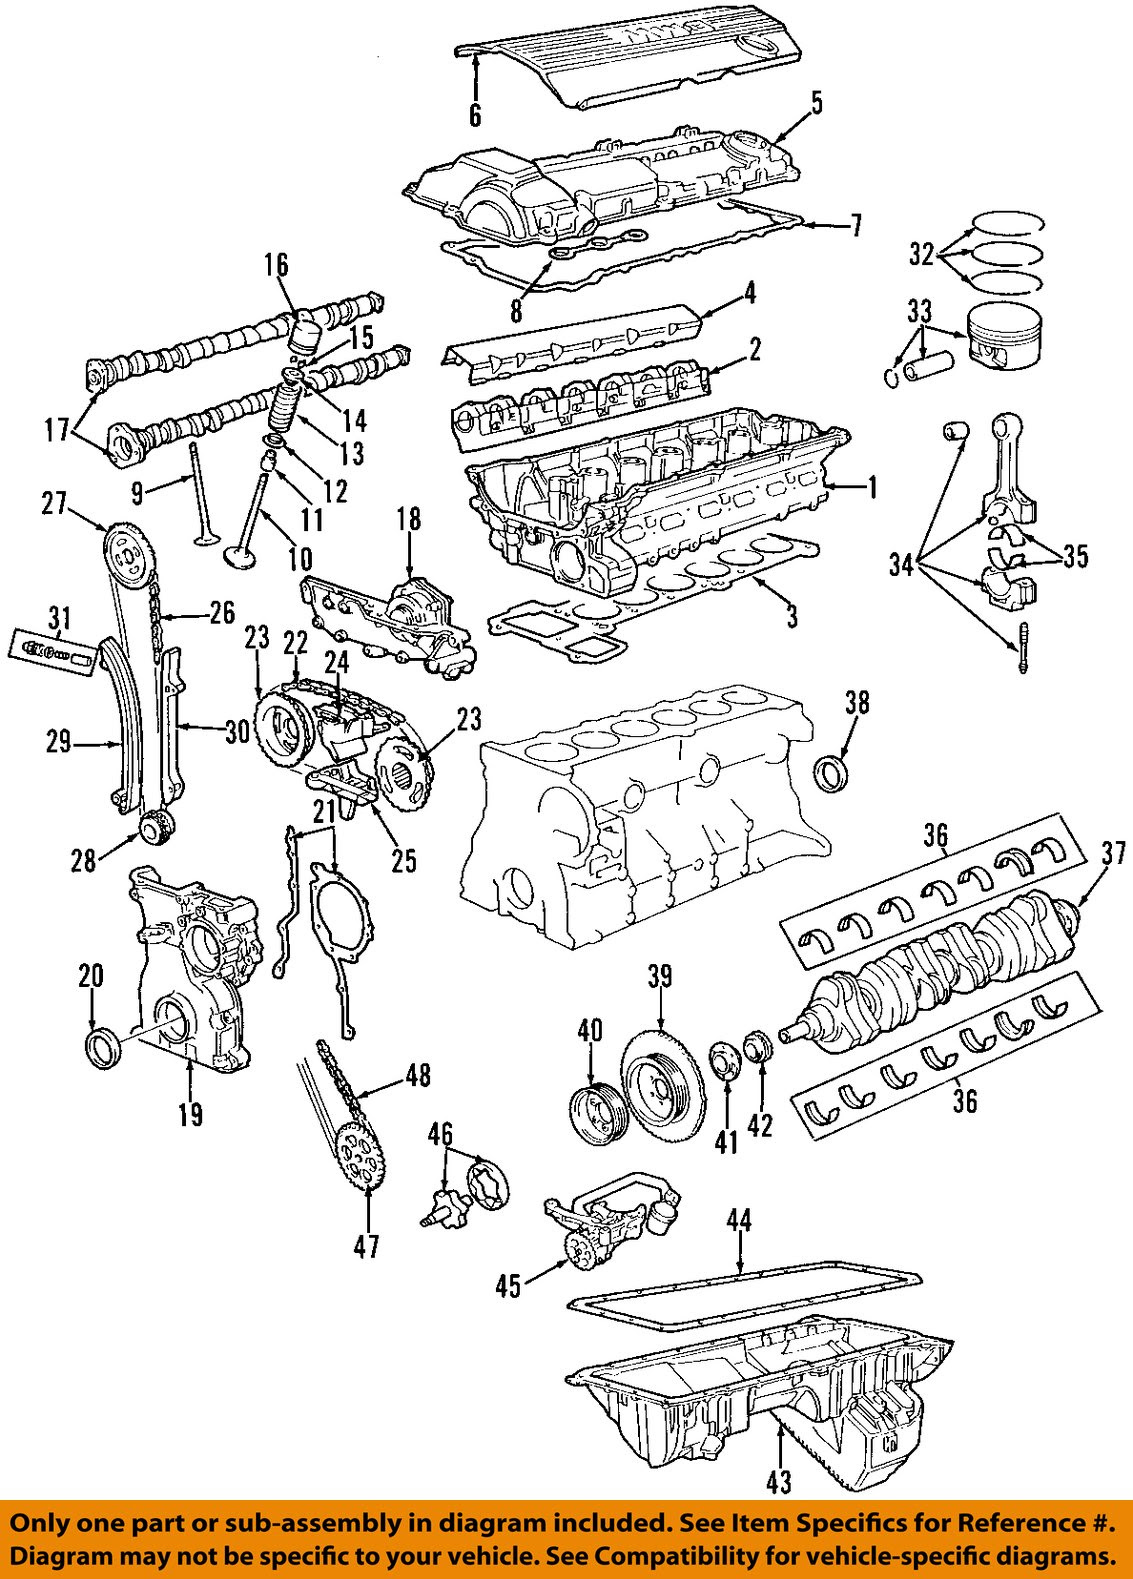 [DIAGRAM_4FR]  2008 Bmw 328i Water Pump Fuse - Thxsiempre | 2008 Bmw 325i Wiring Diagram |  | Thxsiempre